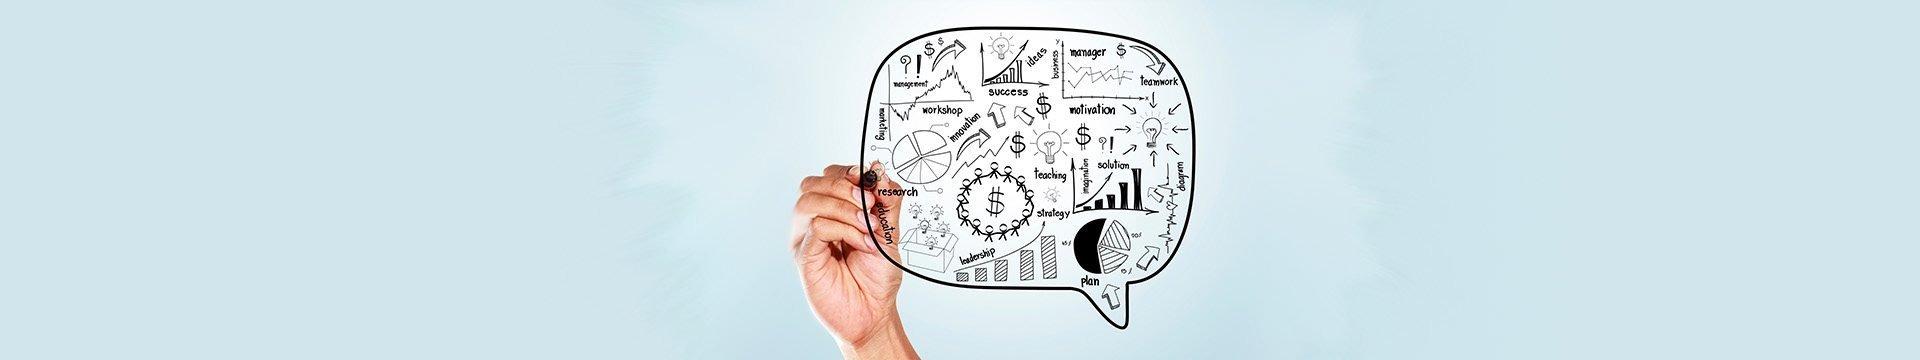 Бизнес обучения и тренинги по програма ПРСР и HR